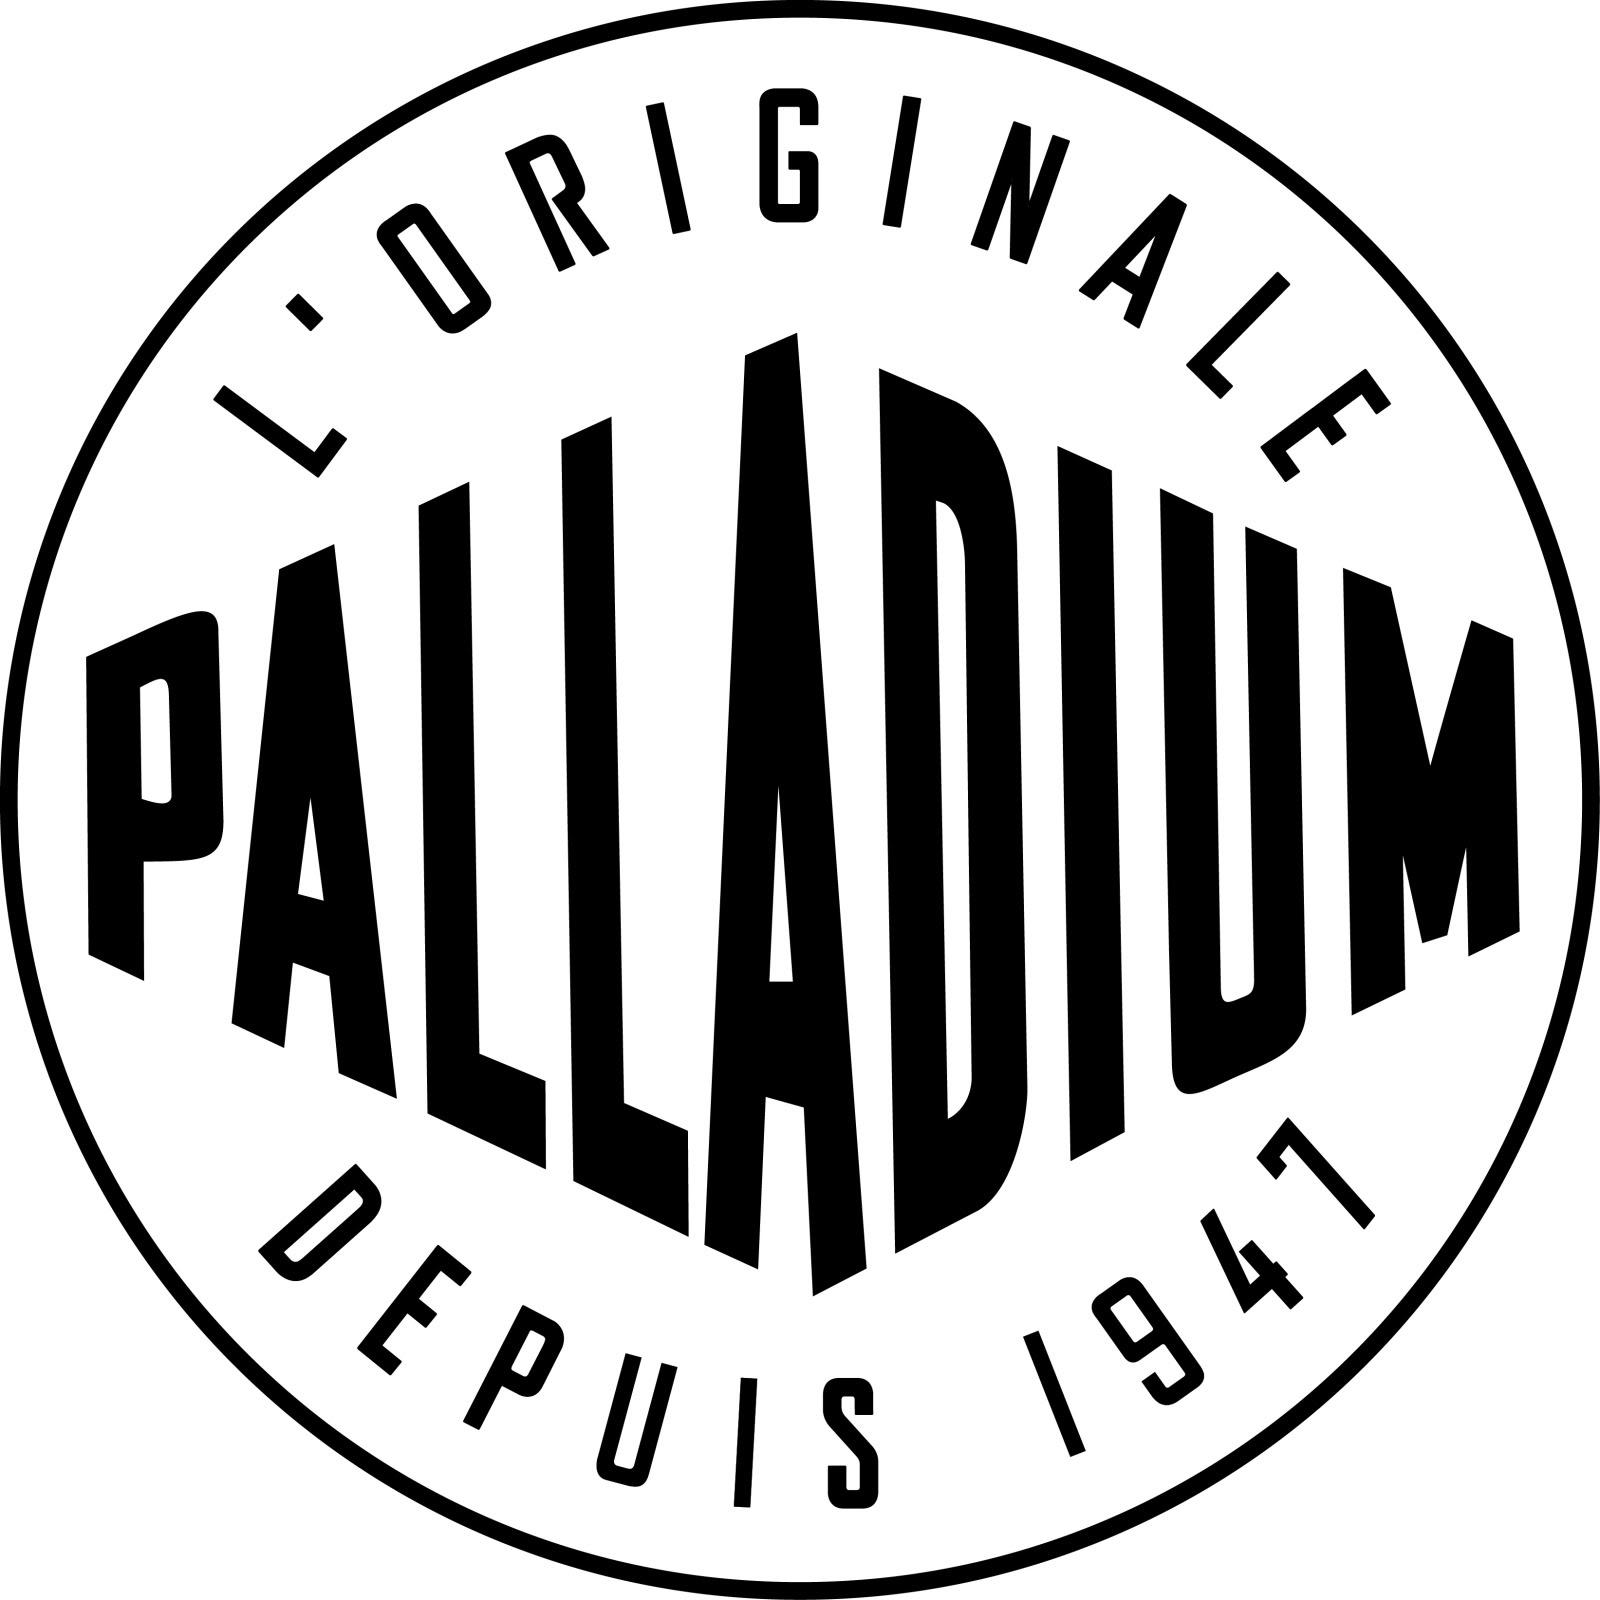 Paladium-3.jpg